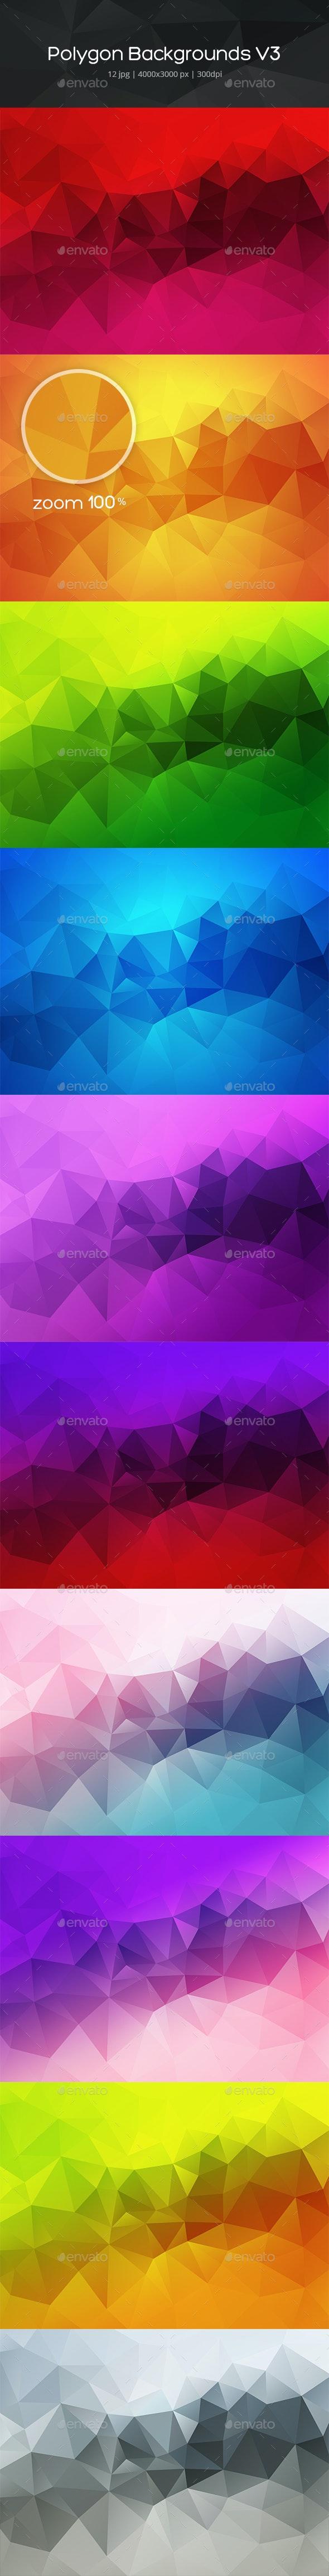 Polygon Backgrounds v3 - Backgrounds Graphics